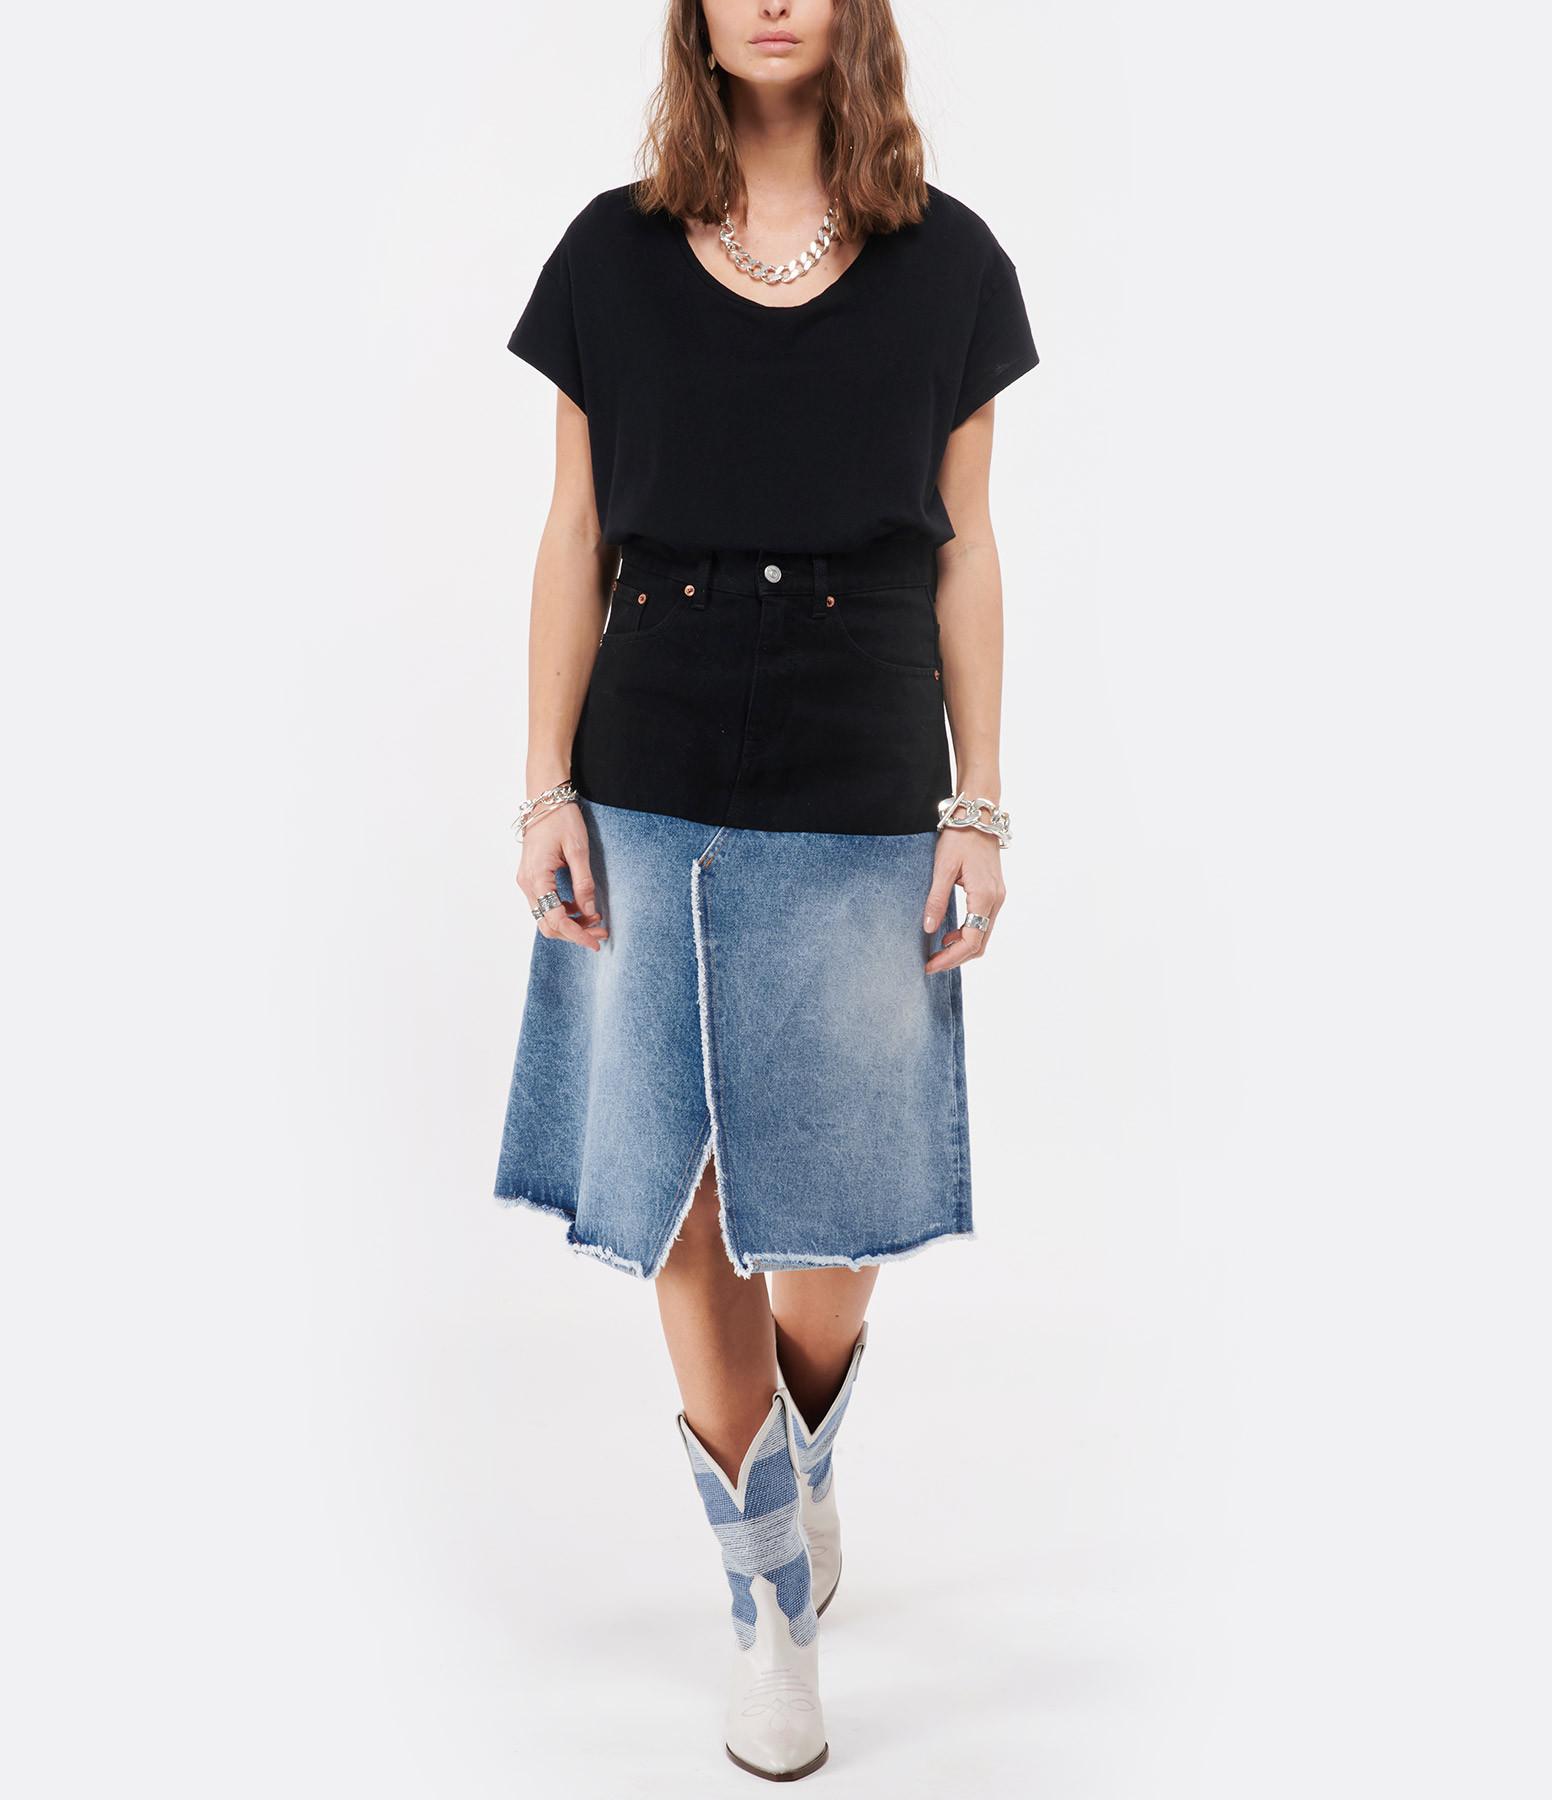 JEANNE VOULAND - Tee-shirt Bach Coton Lin Noir